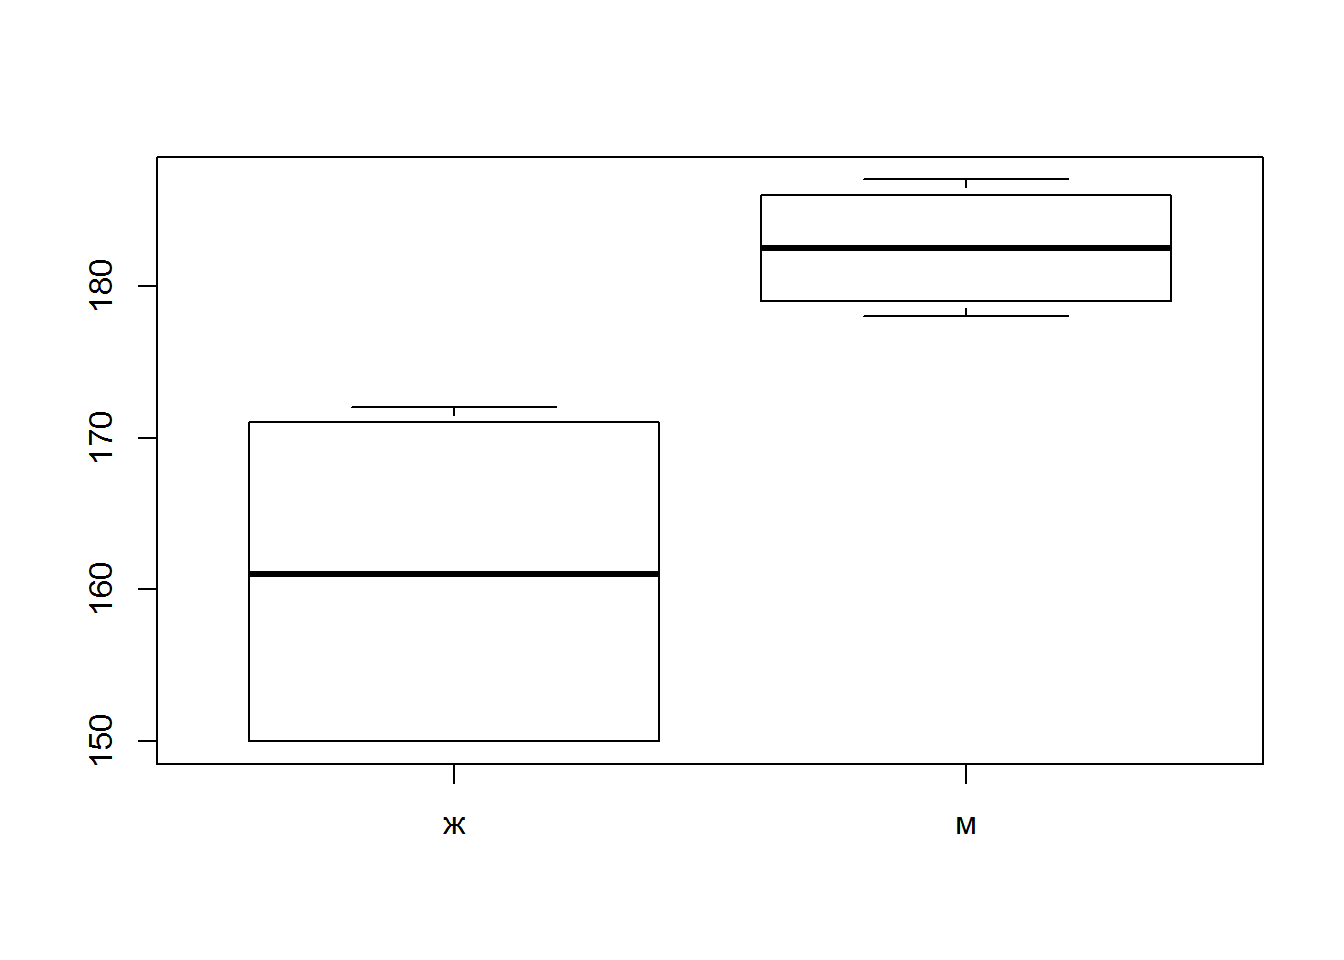 600d66cc-f336-4f69-8ab6-62e008da33d5